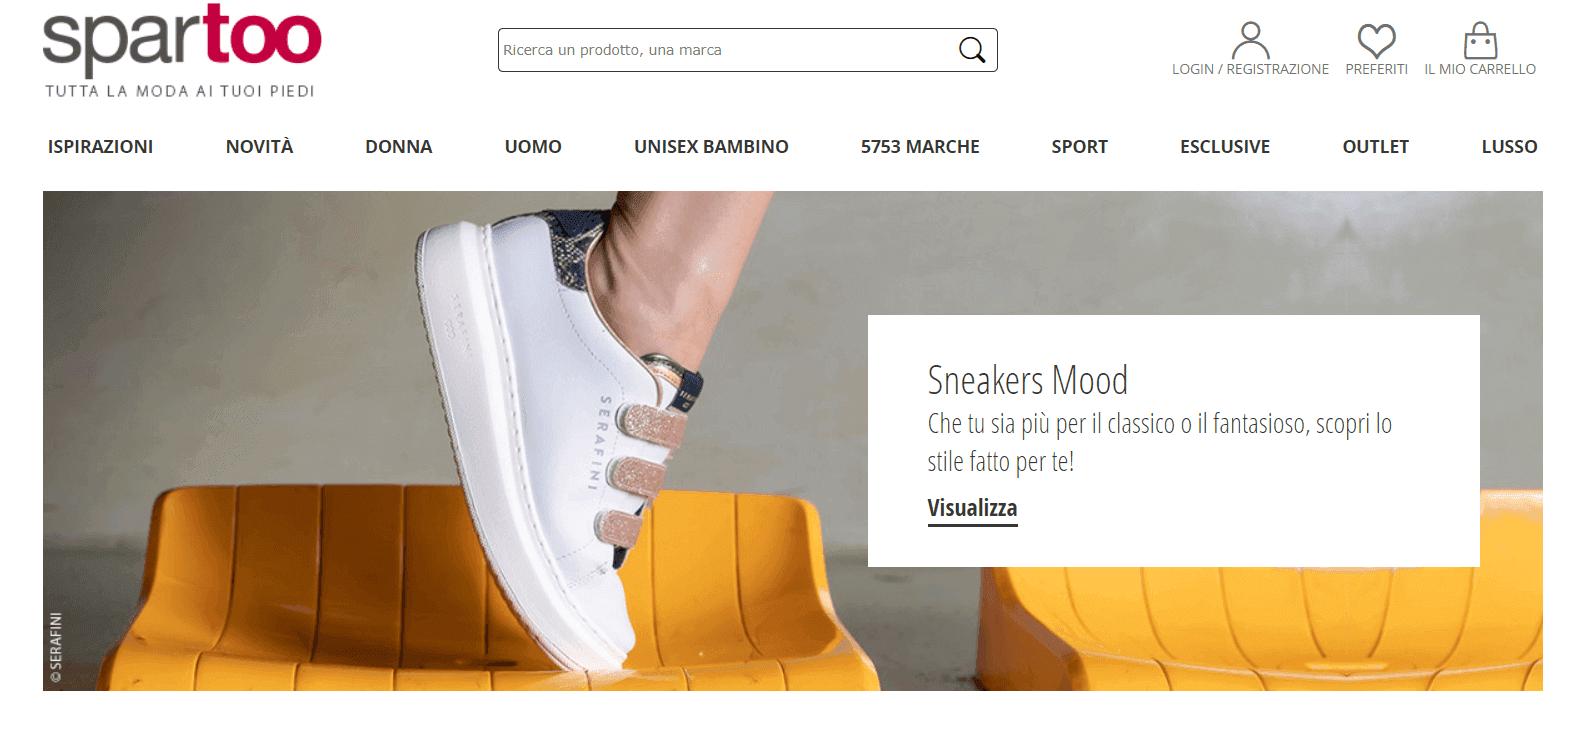 Spartoo купити онлайн з доставкою в Україну - myMeest - 2